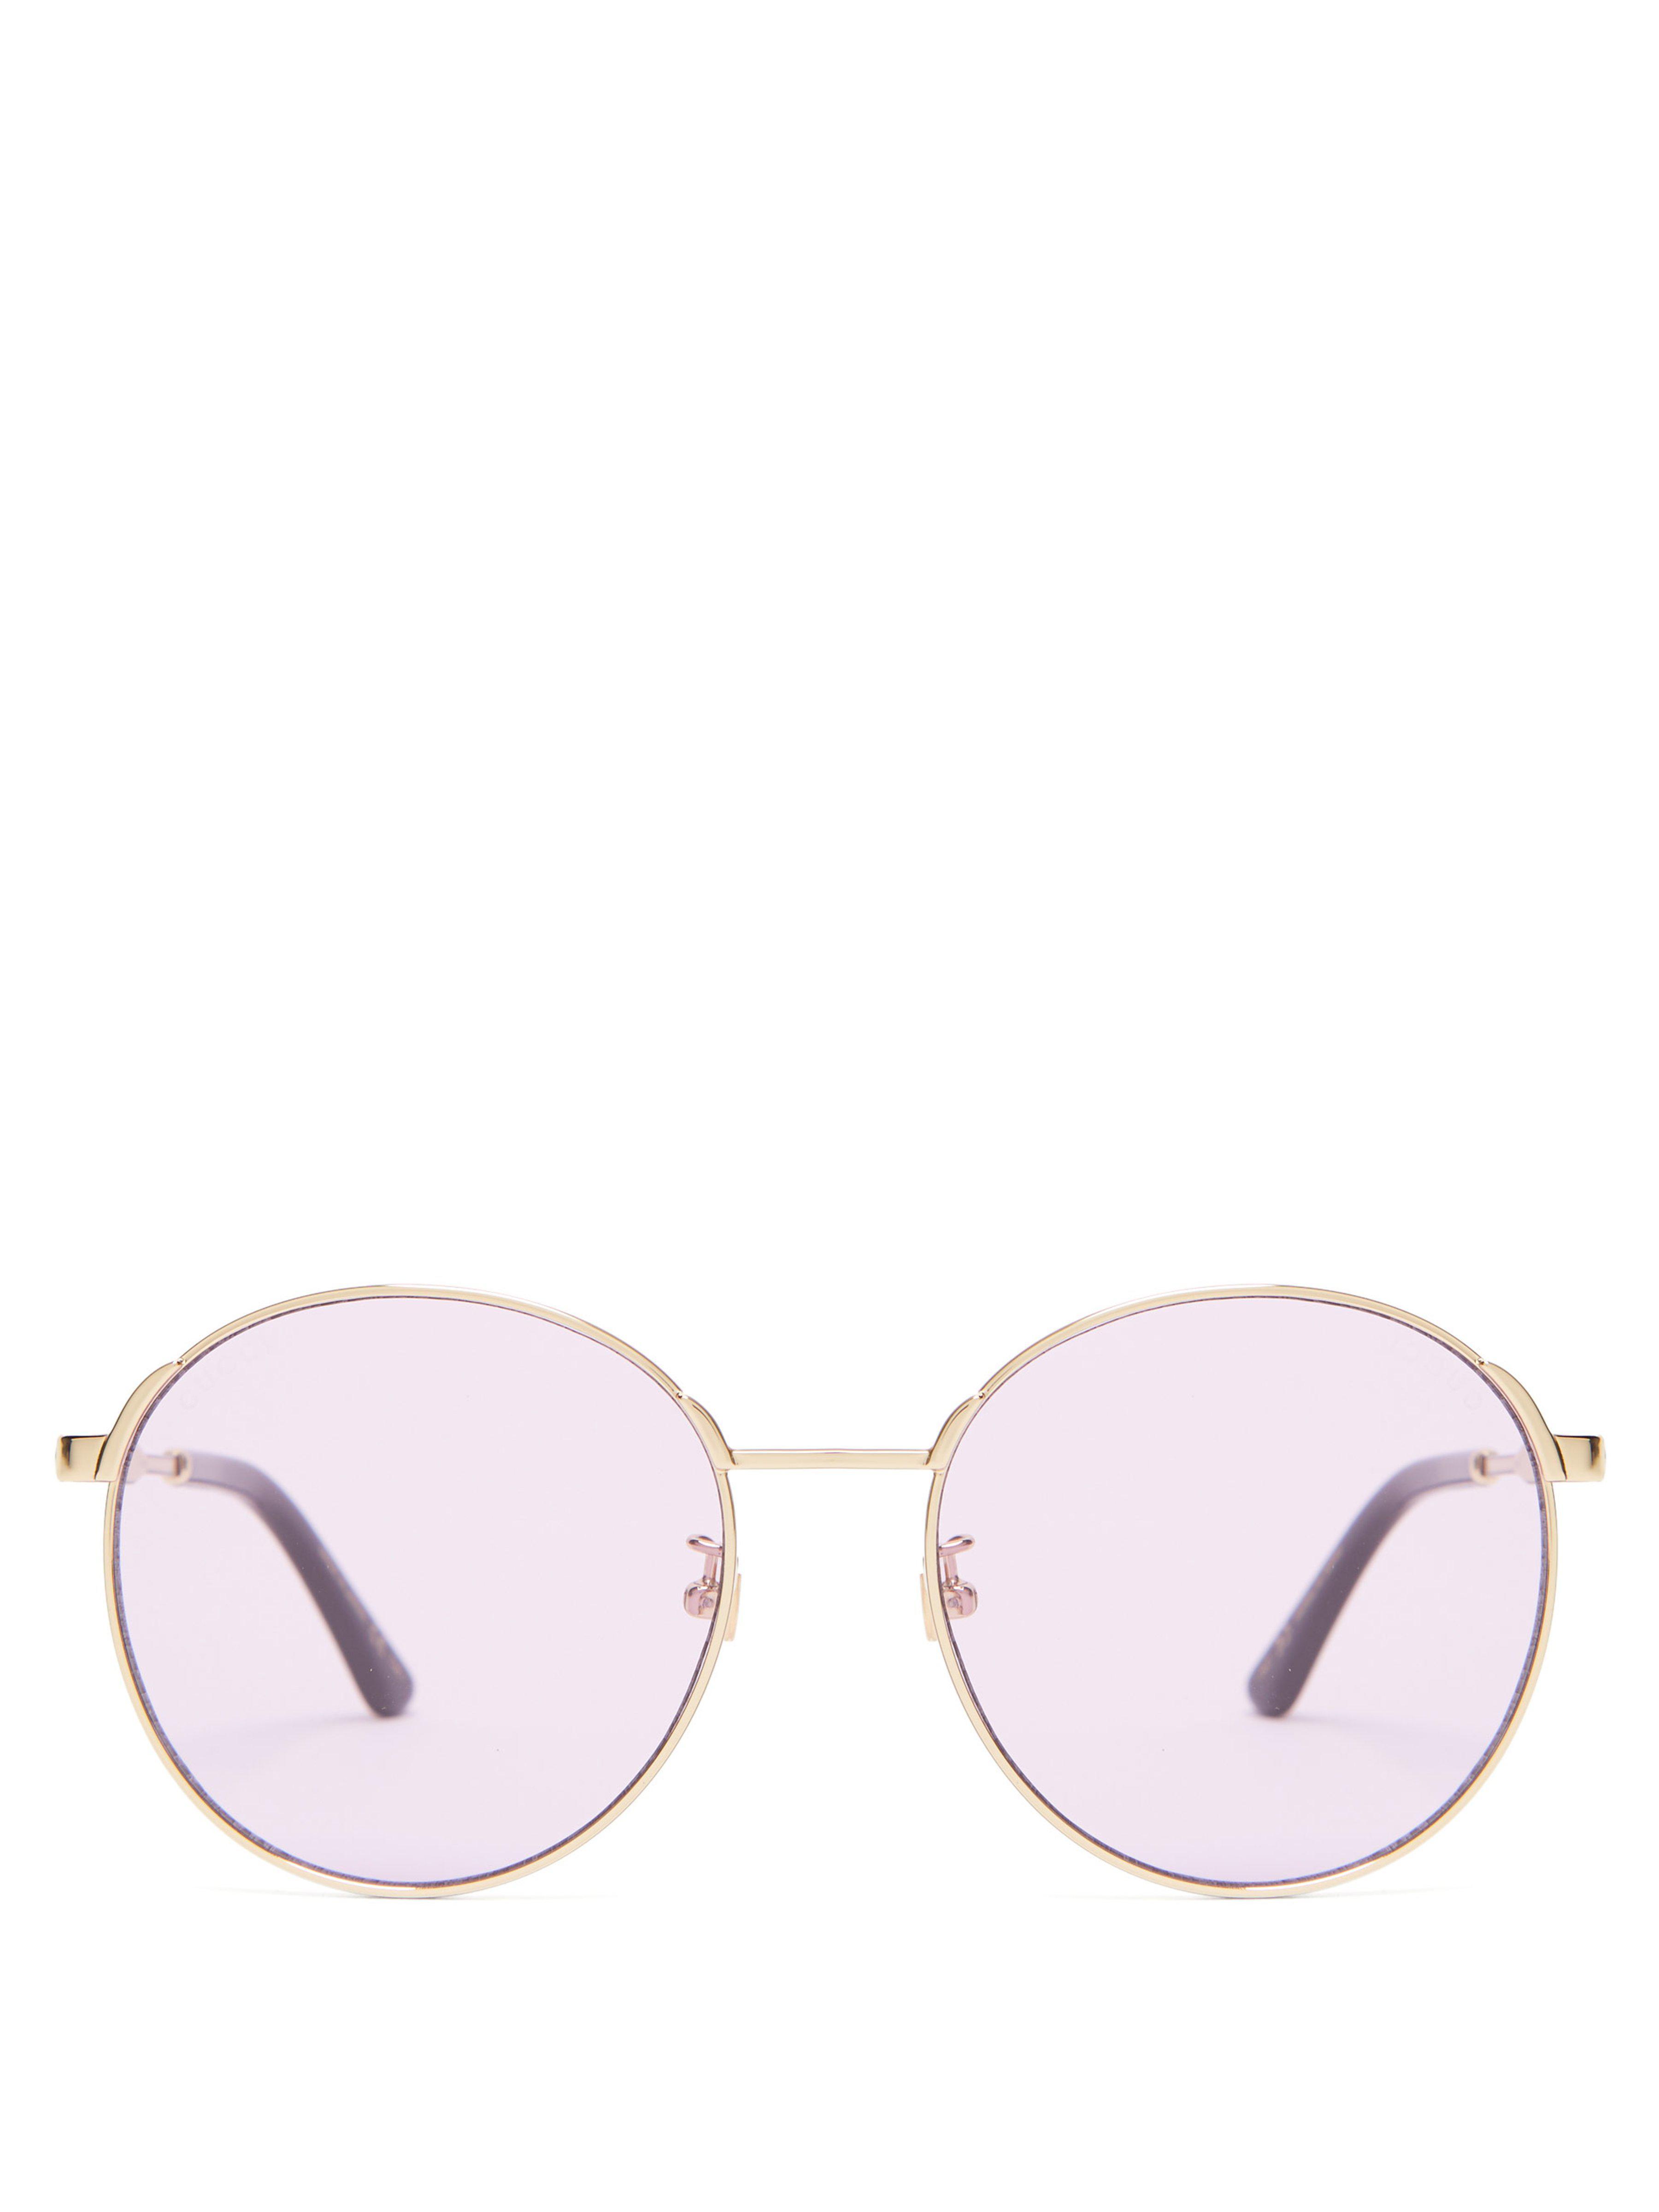 34e537c615c Gucci. Women s Round Frame Metal Sunglasses